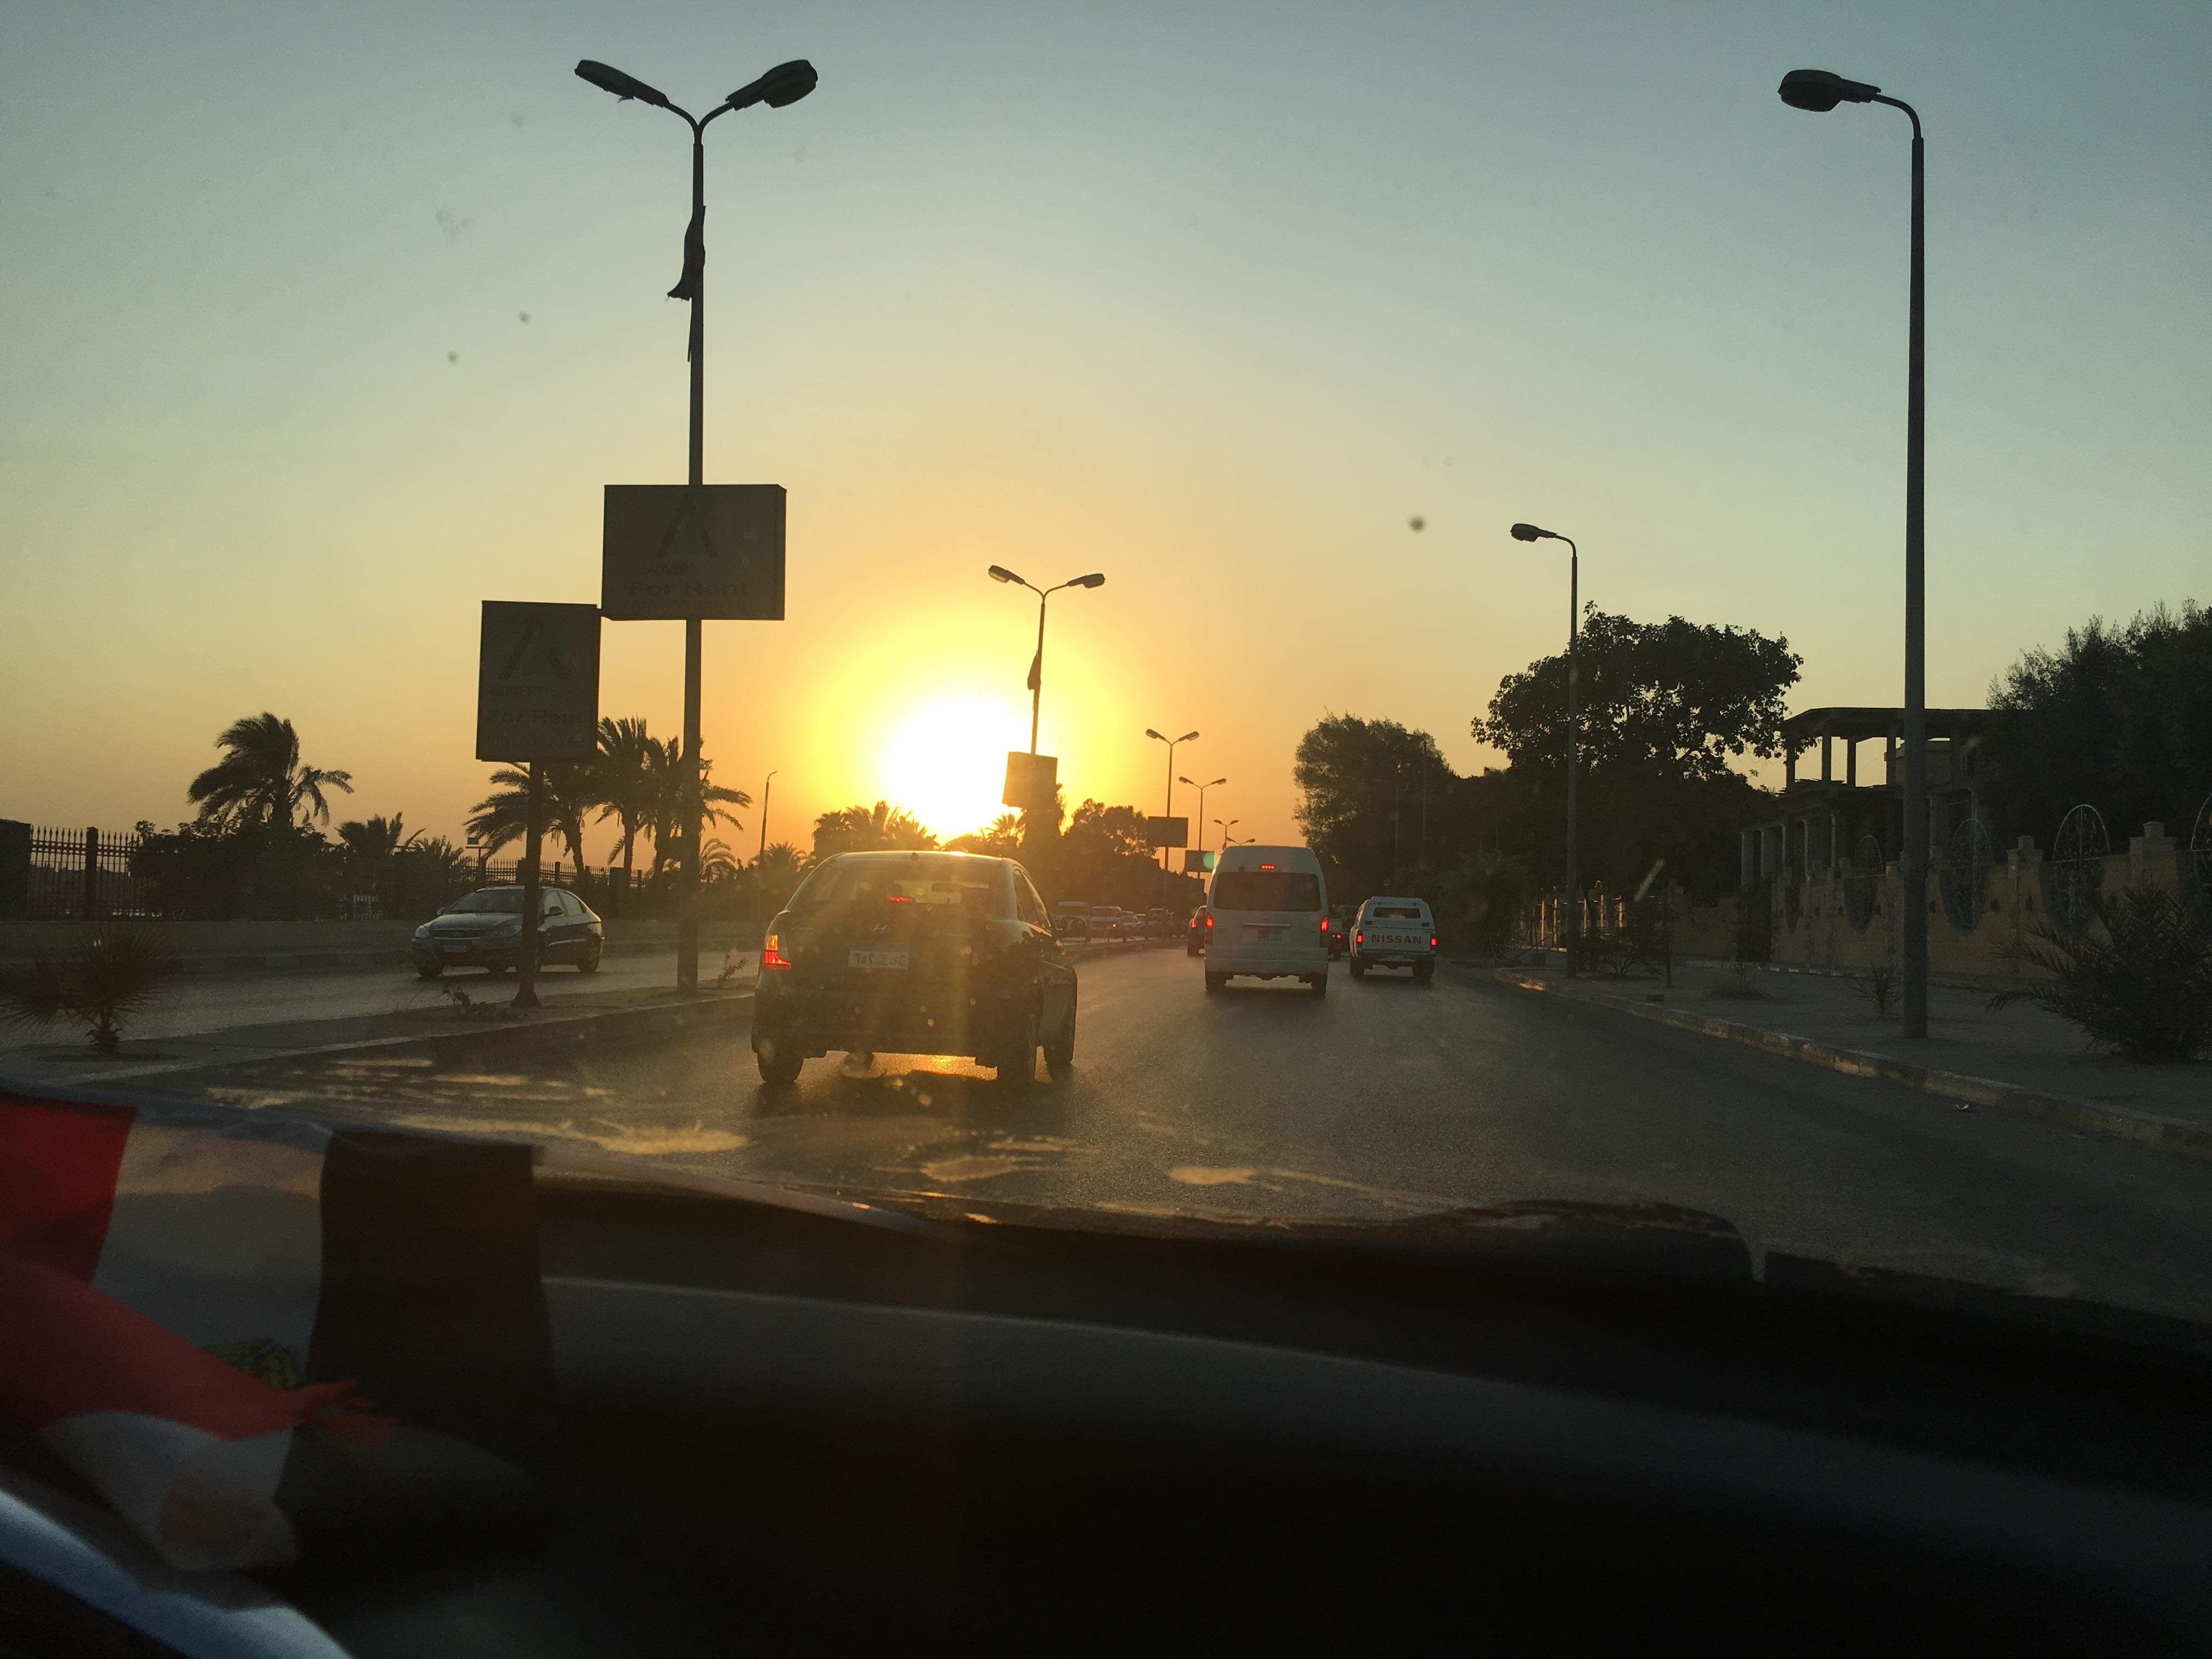 Cairo, Egypt as seen during AIRINC's recent on-site cost of living survey. Photo taken by AIRINC surveyor Omar Tarabishi.